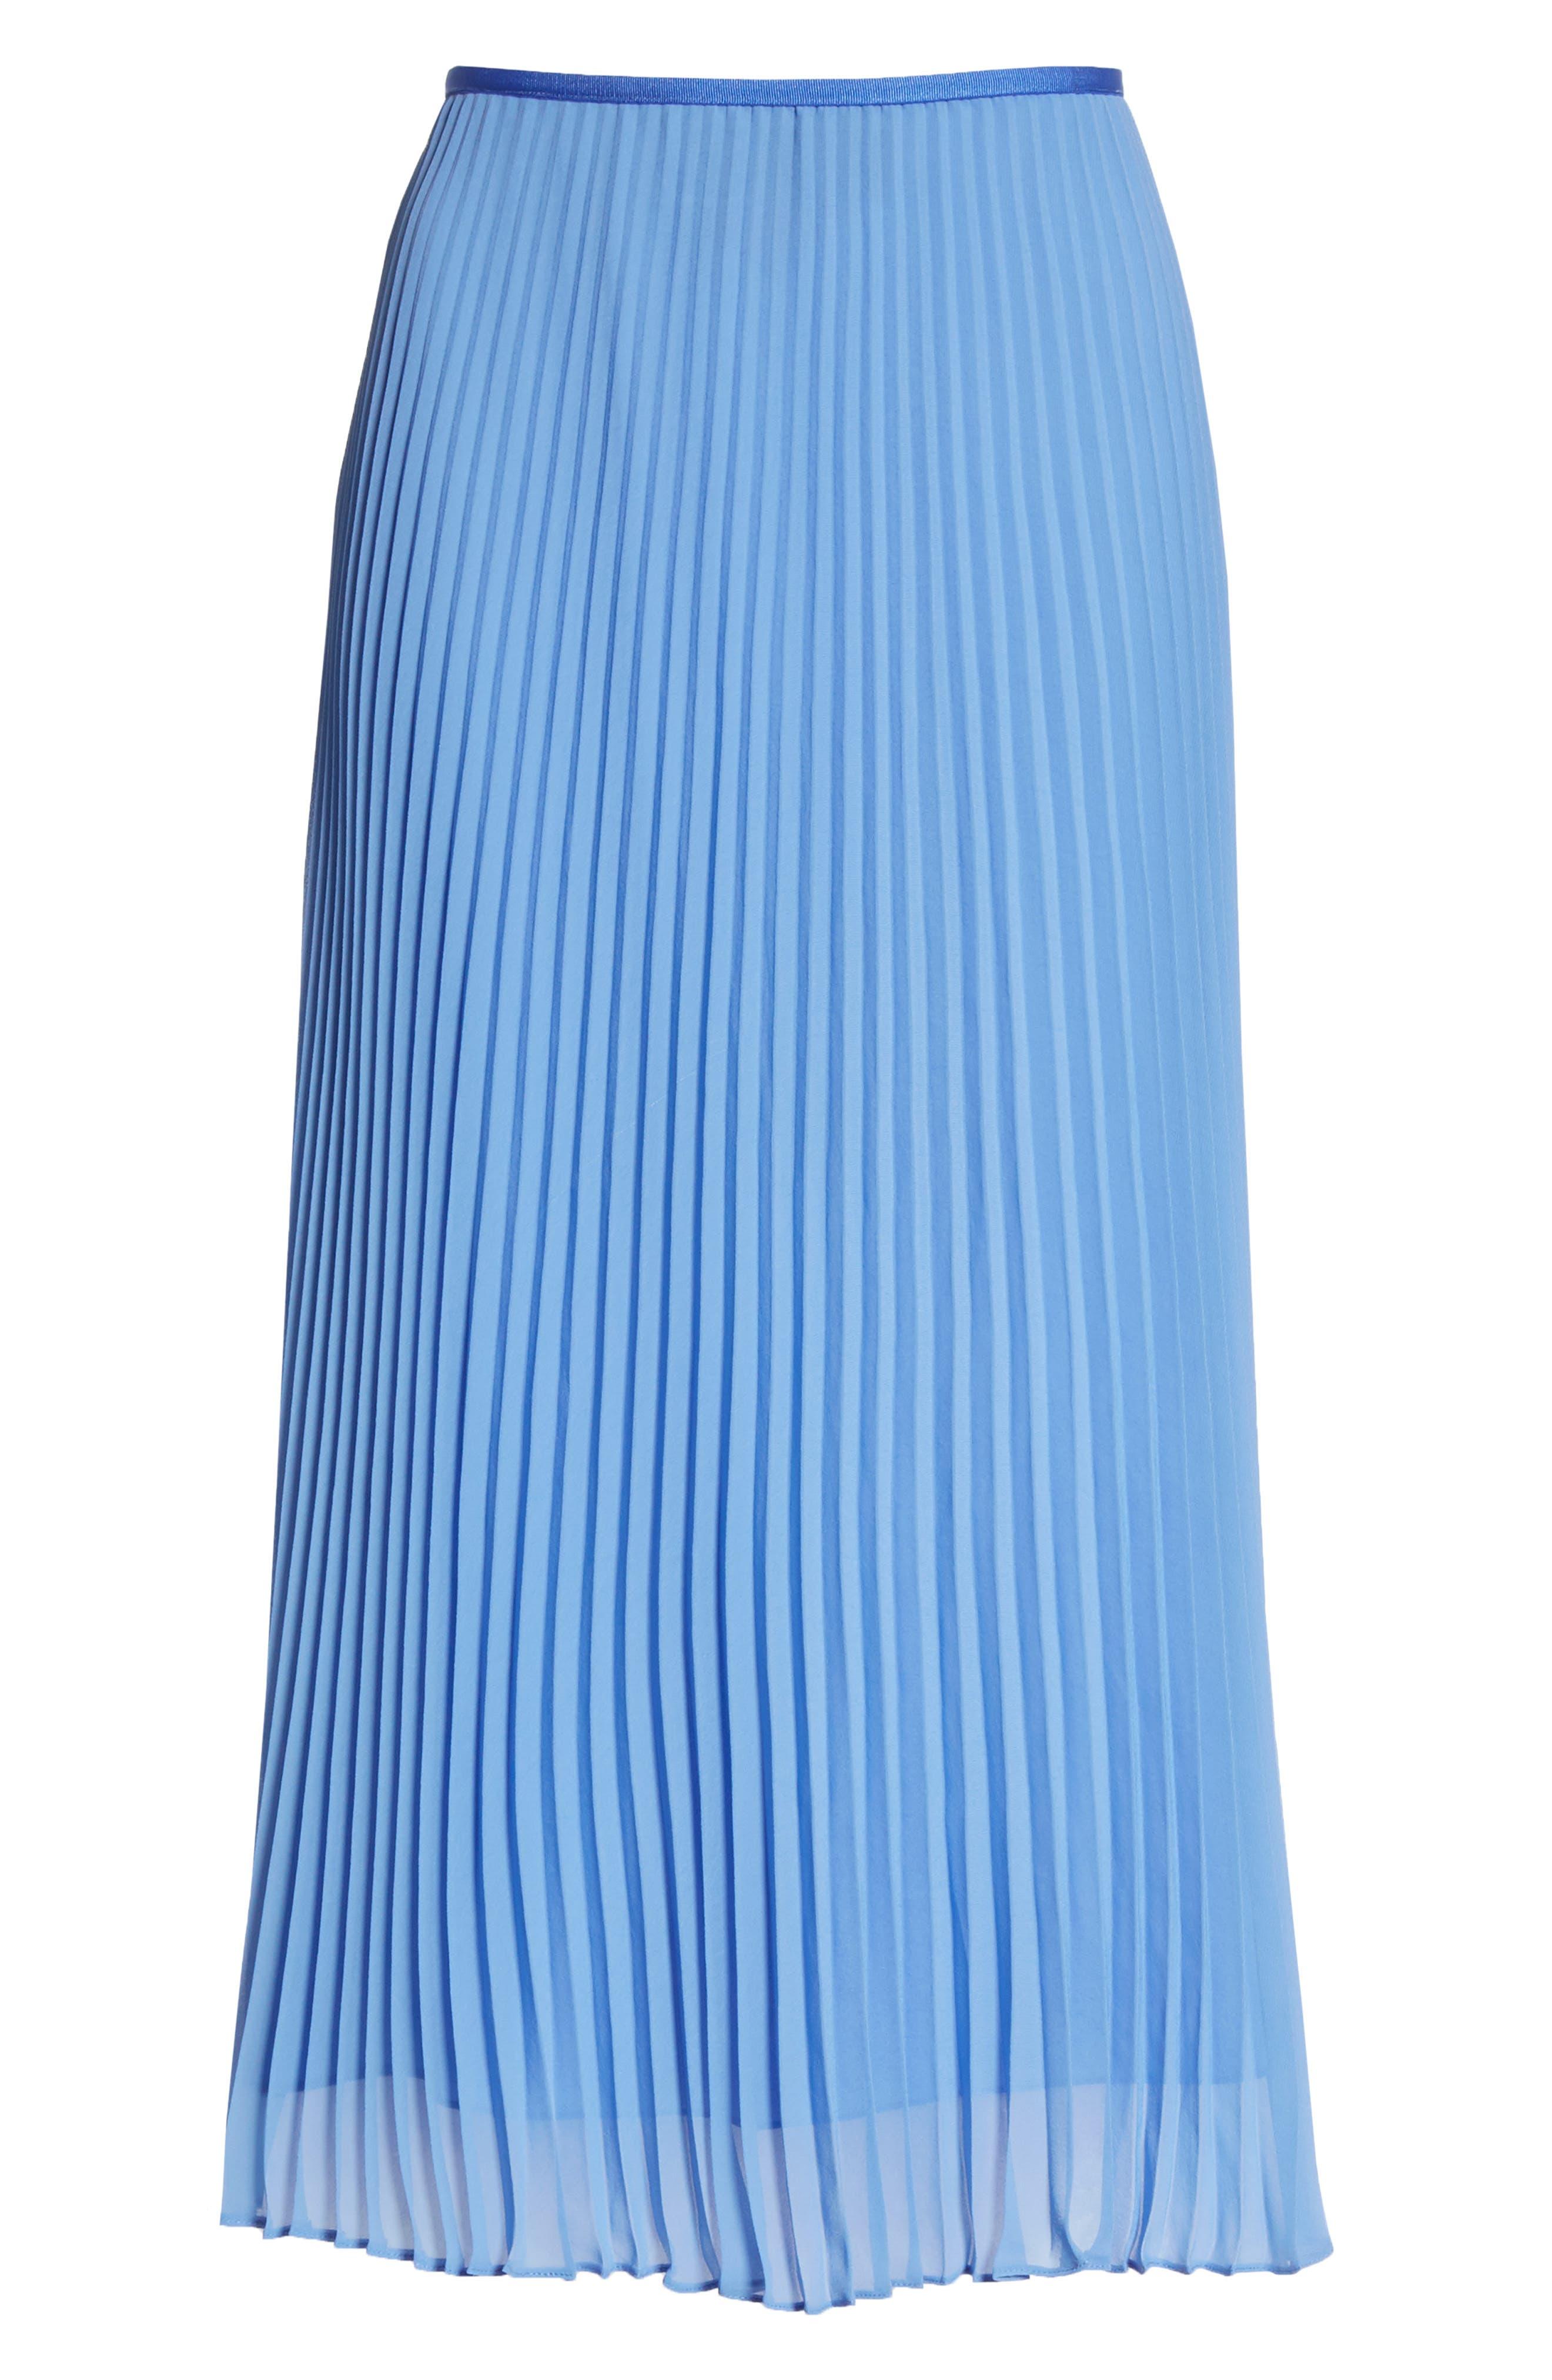 Pleat Midi Skirt,                             Alternate thumbnail 6, color,                             BERMUDA BLUE